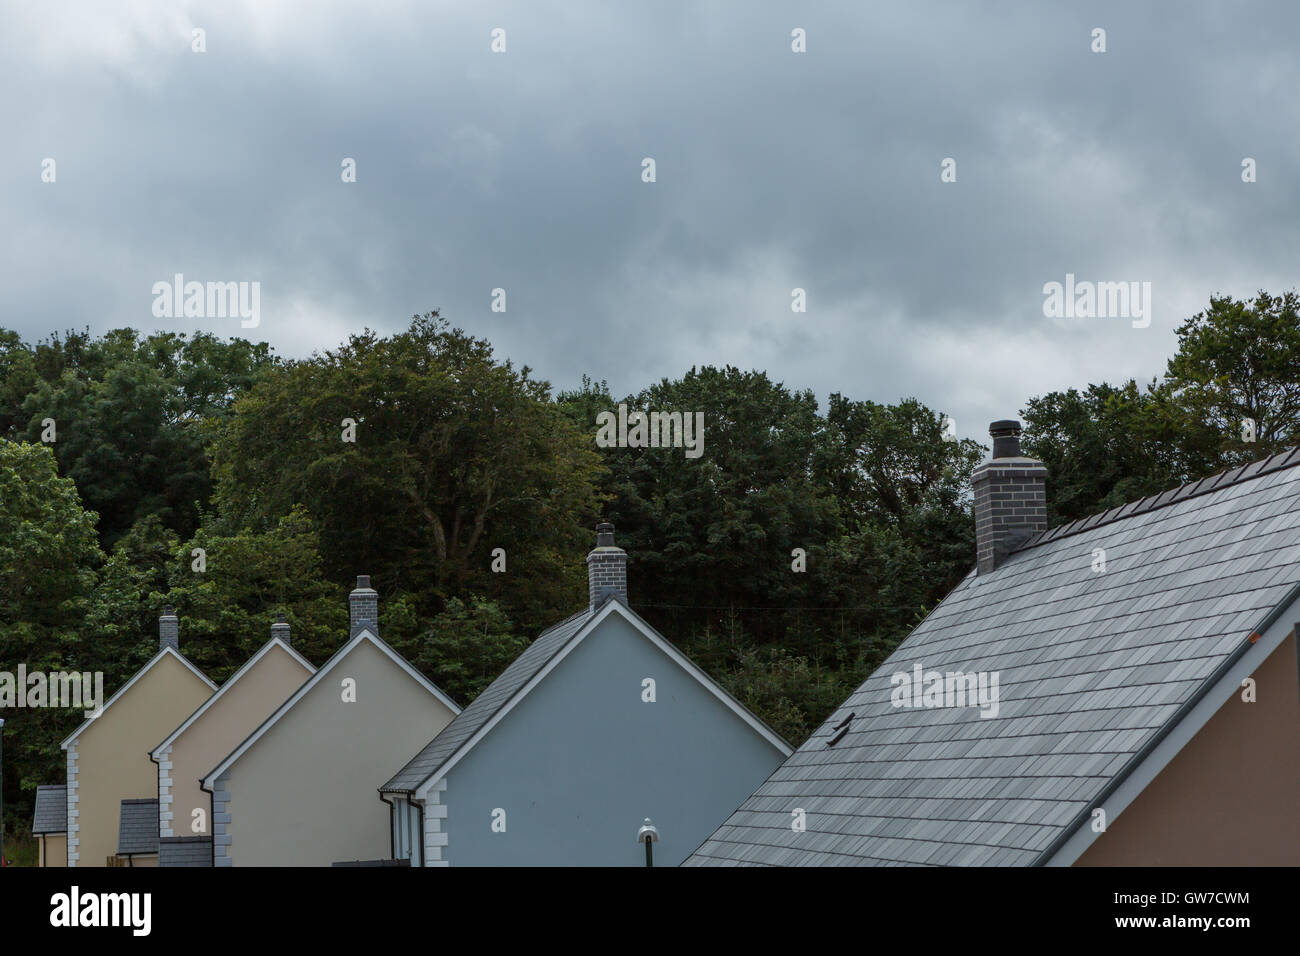 5 rooftops in a row.  © Ian Jones/Alamy Live News - Stock Image